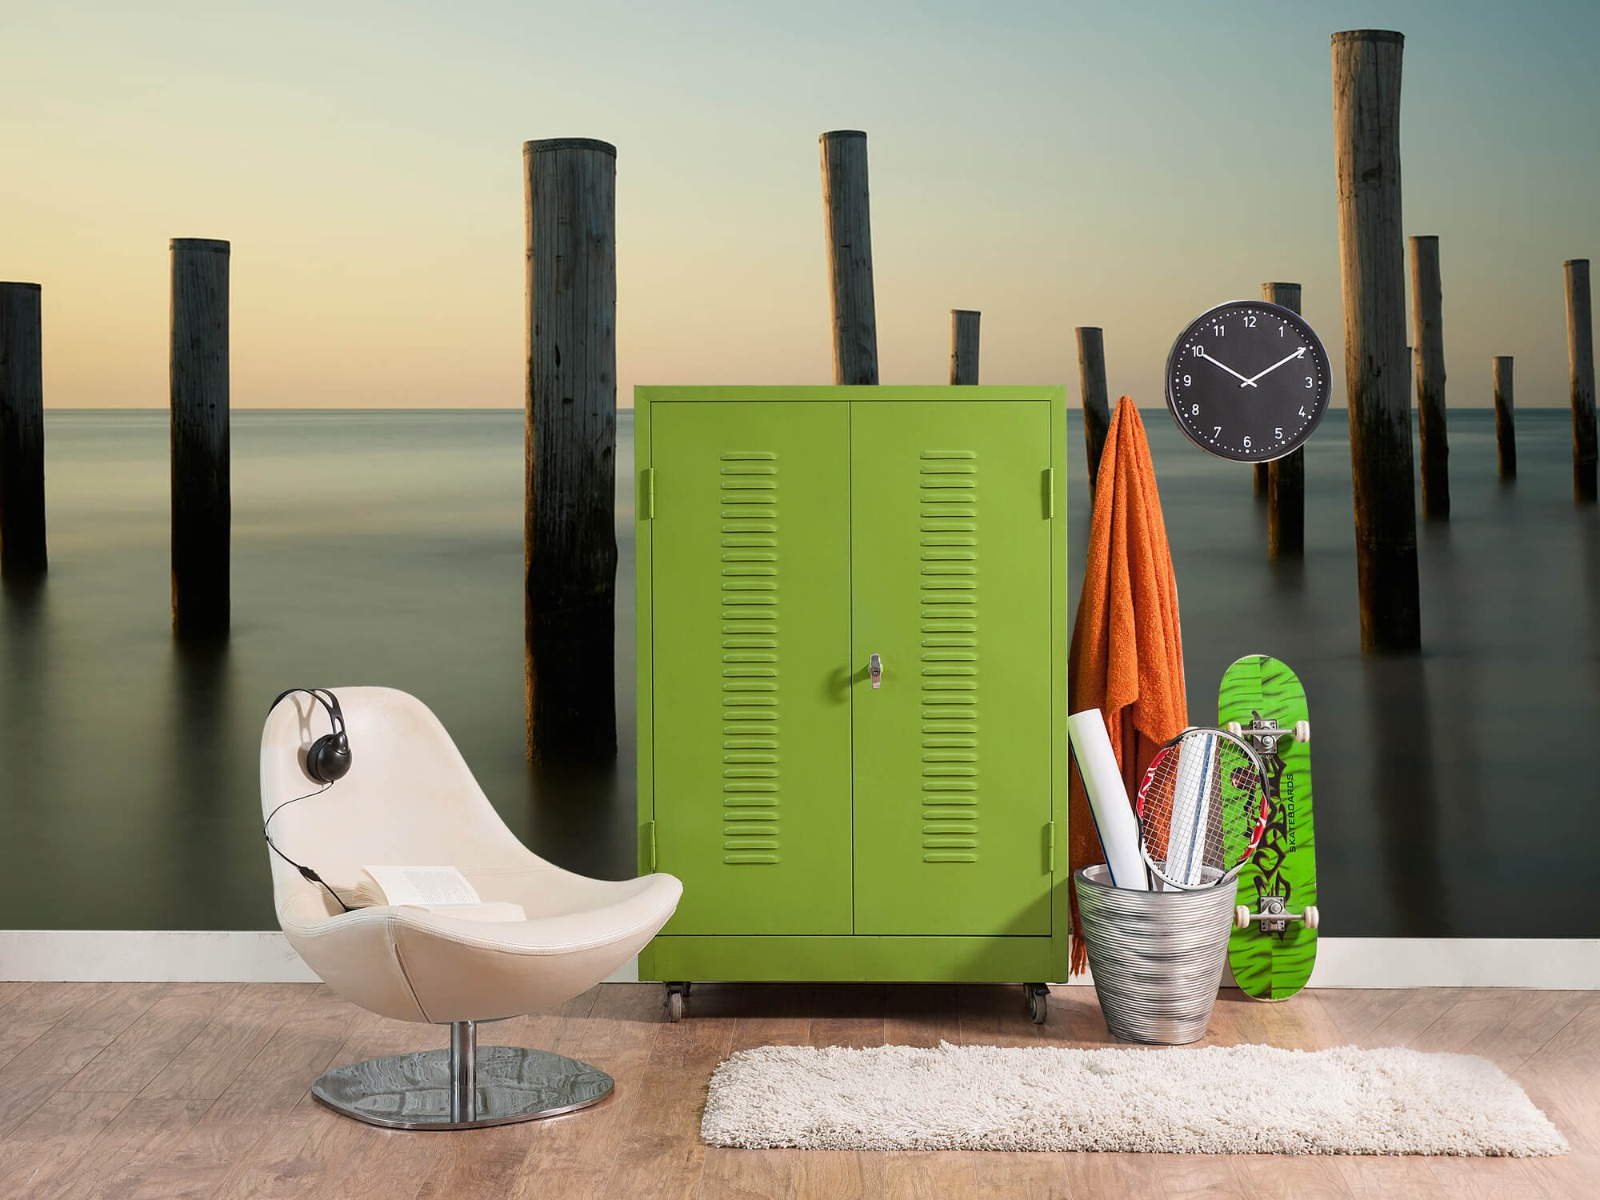 Zeeën en Oceanen - Houten strandpalen - Slaapkamer 19